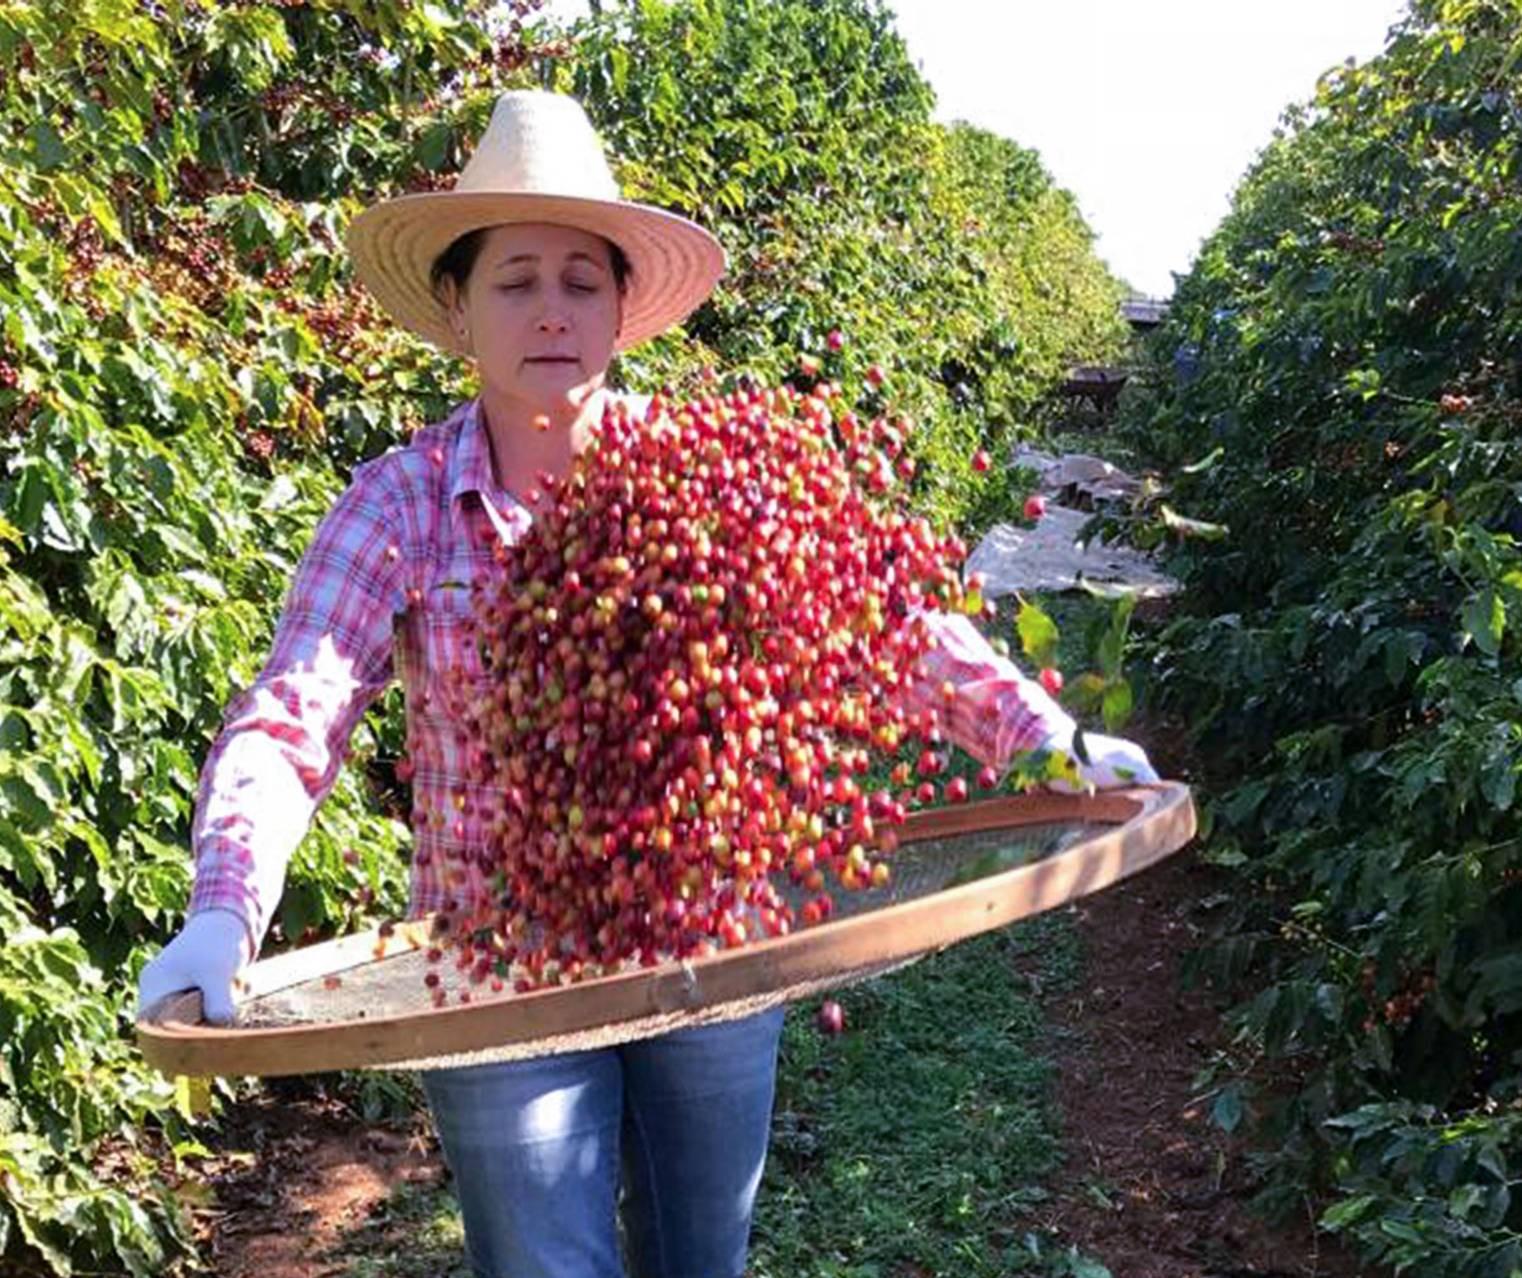 15 de outubro: Dia Internacional da Mulher Rural